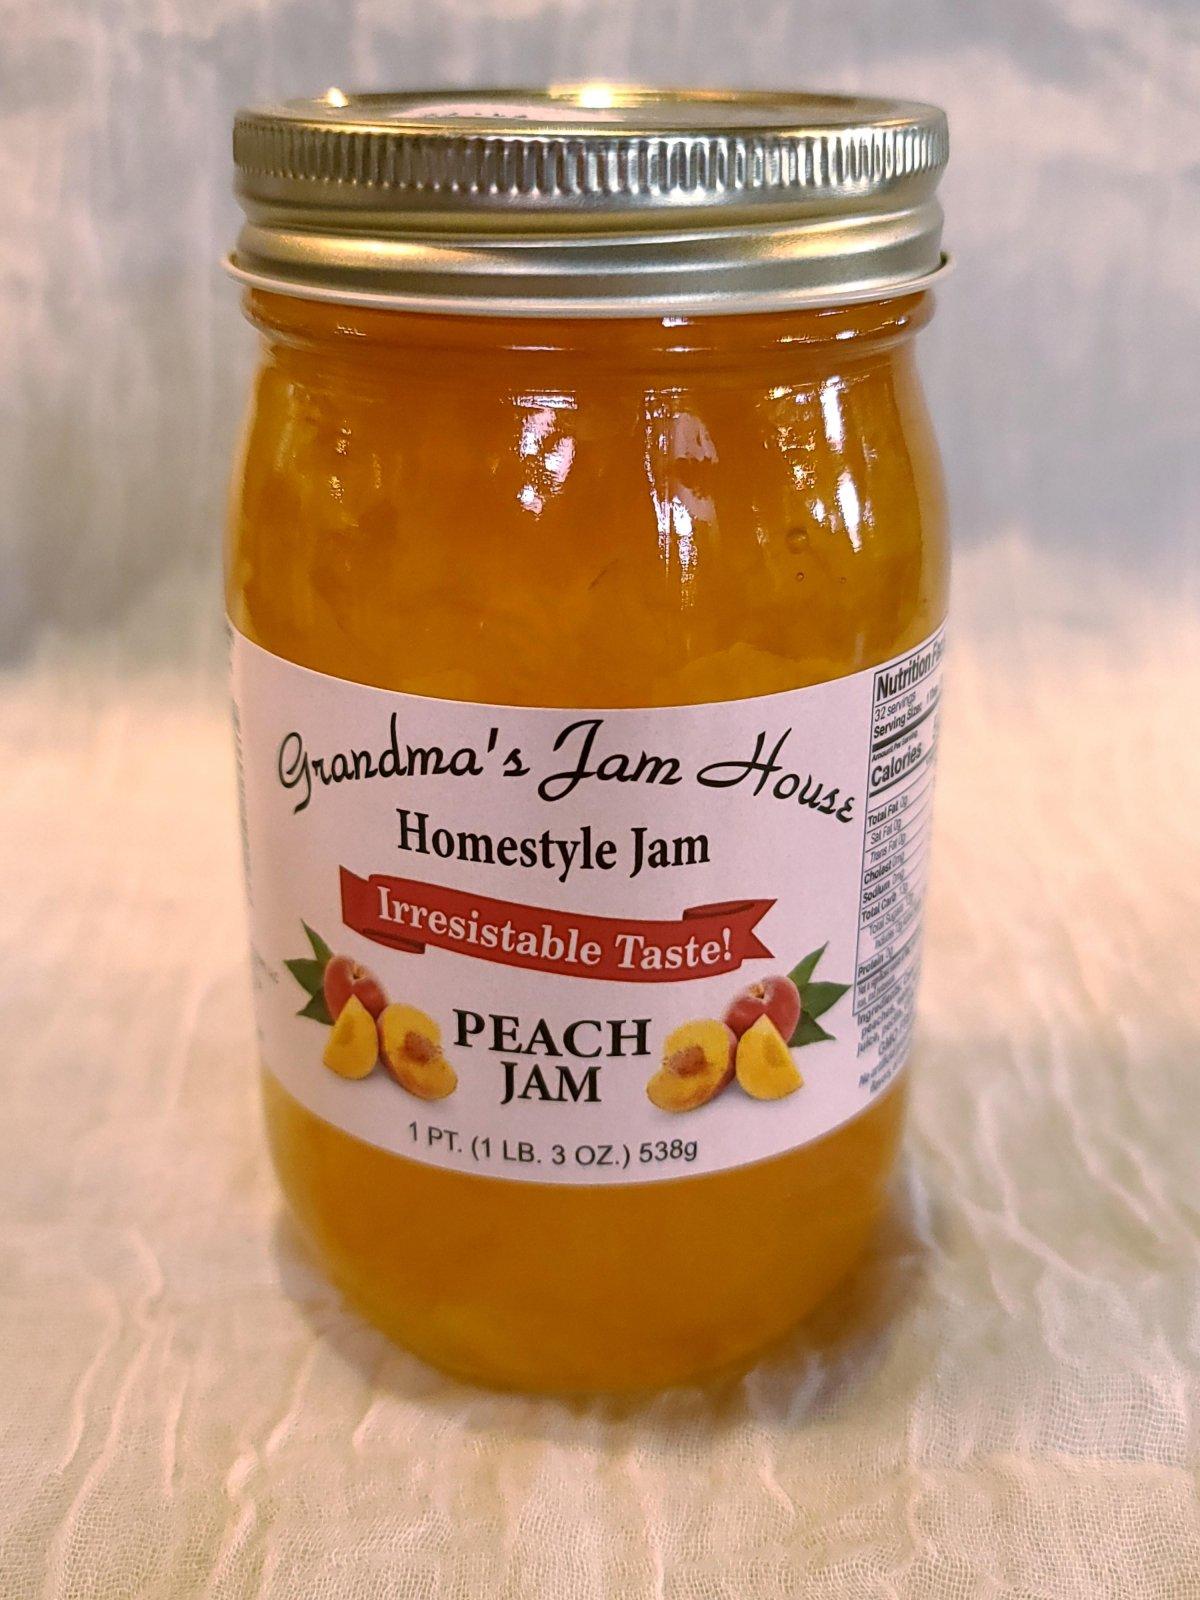 Grandma's Jam House - Peach Jam